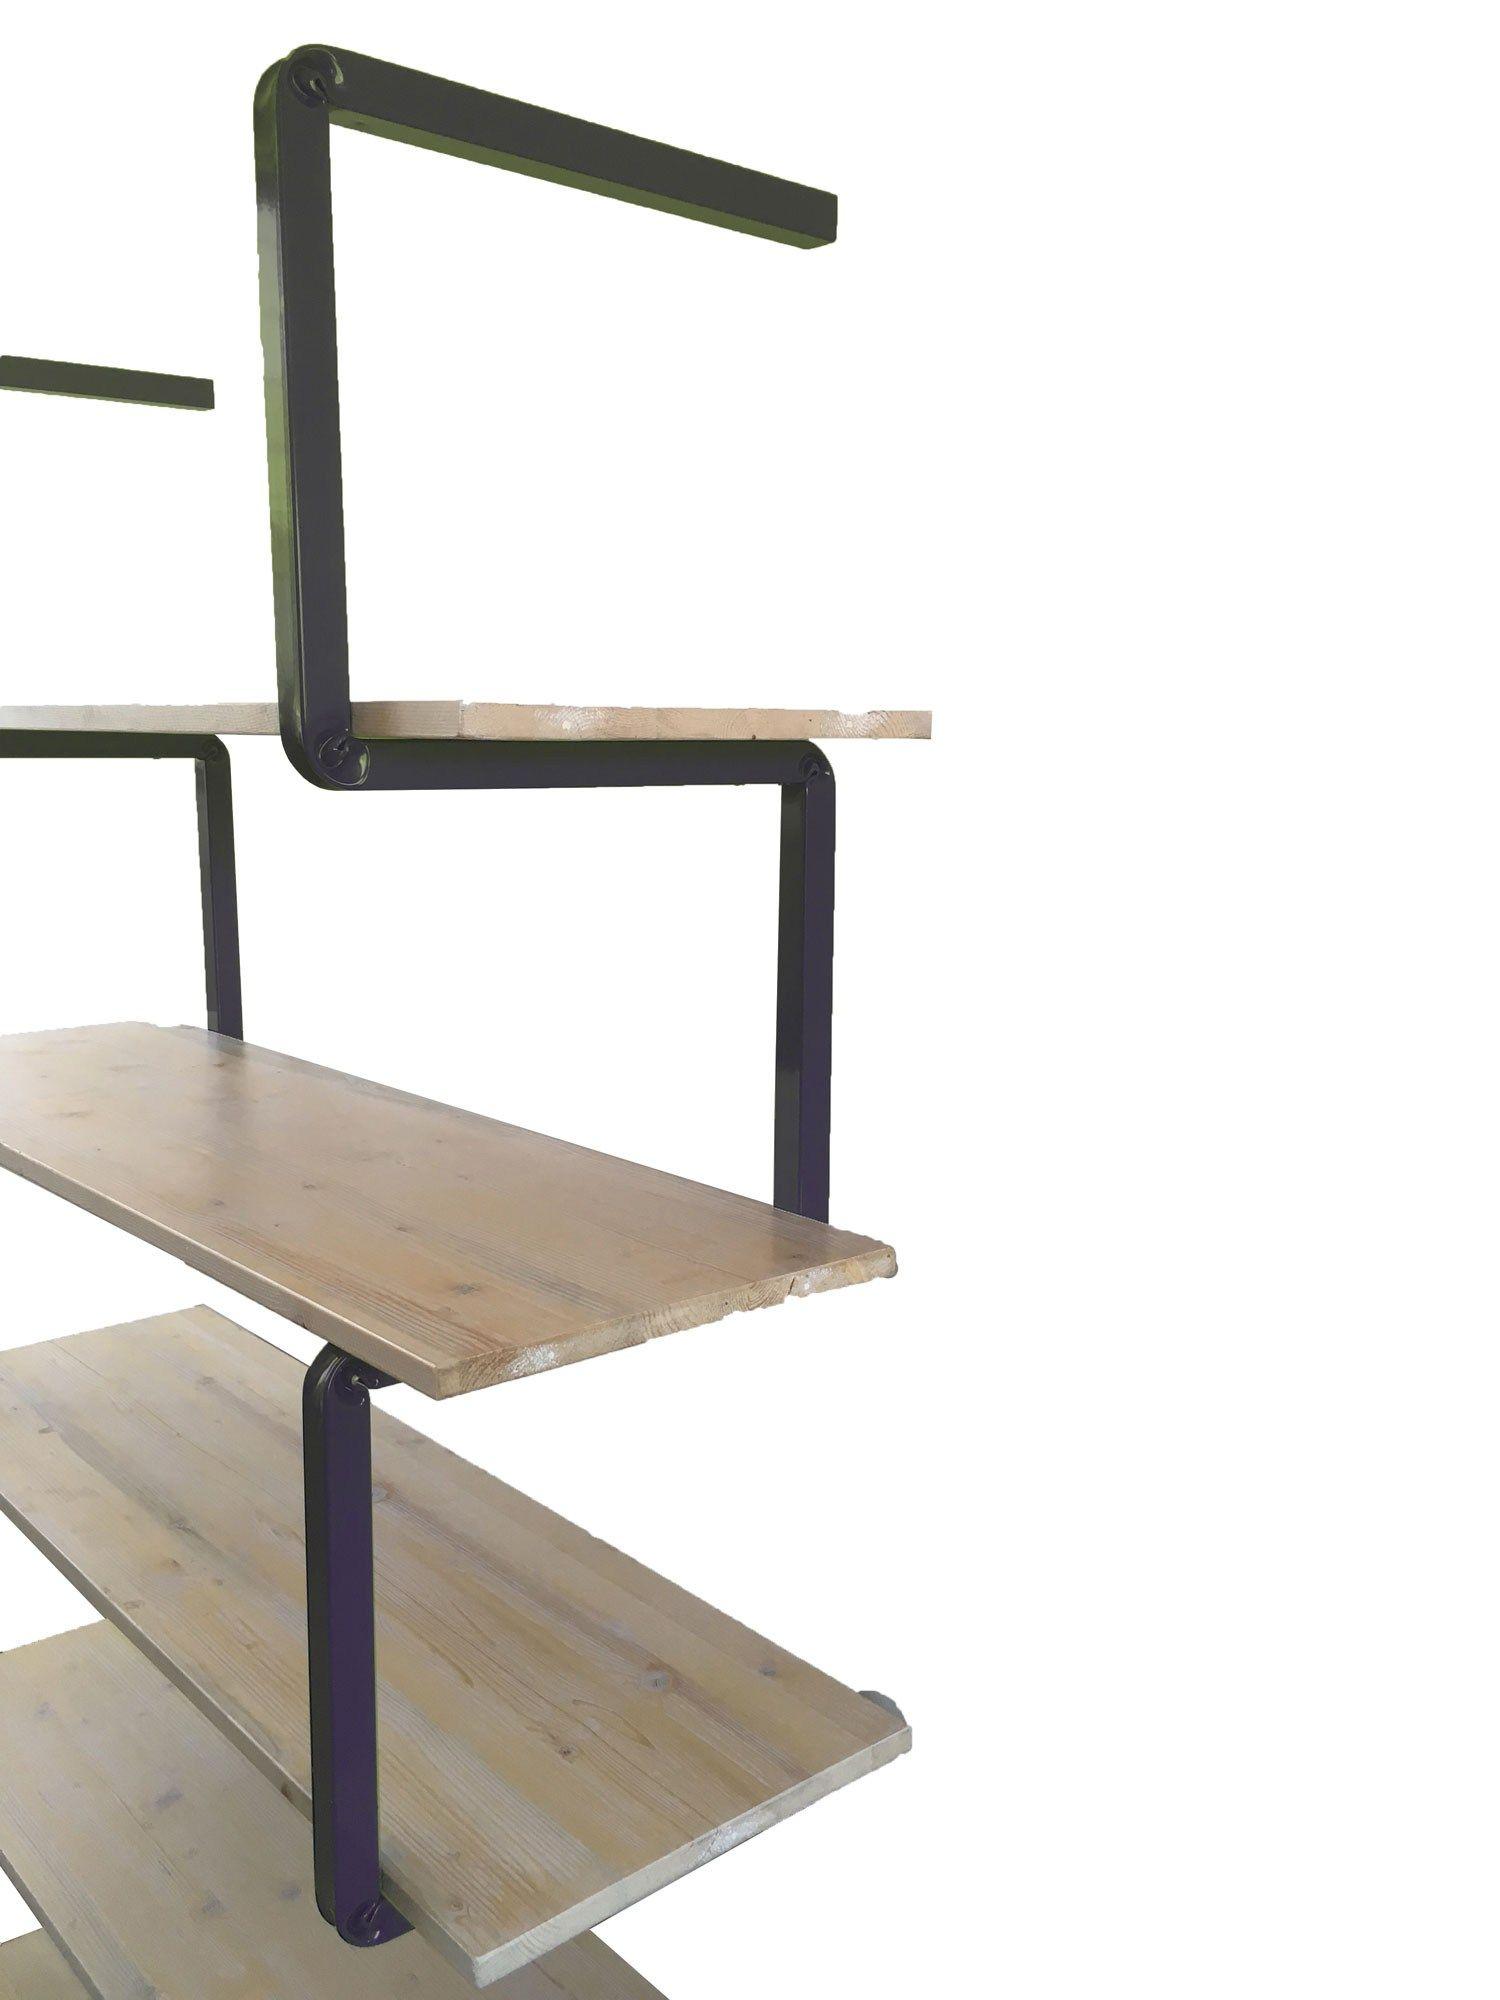 offenes regal aus stahl und holz series by. Black Bedroom Furniture Sets. Home Design Ideas